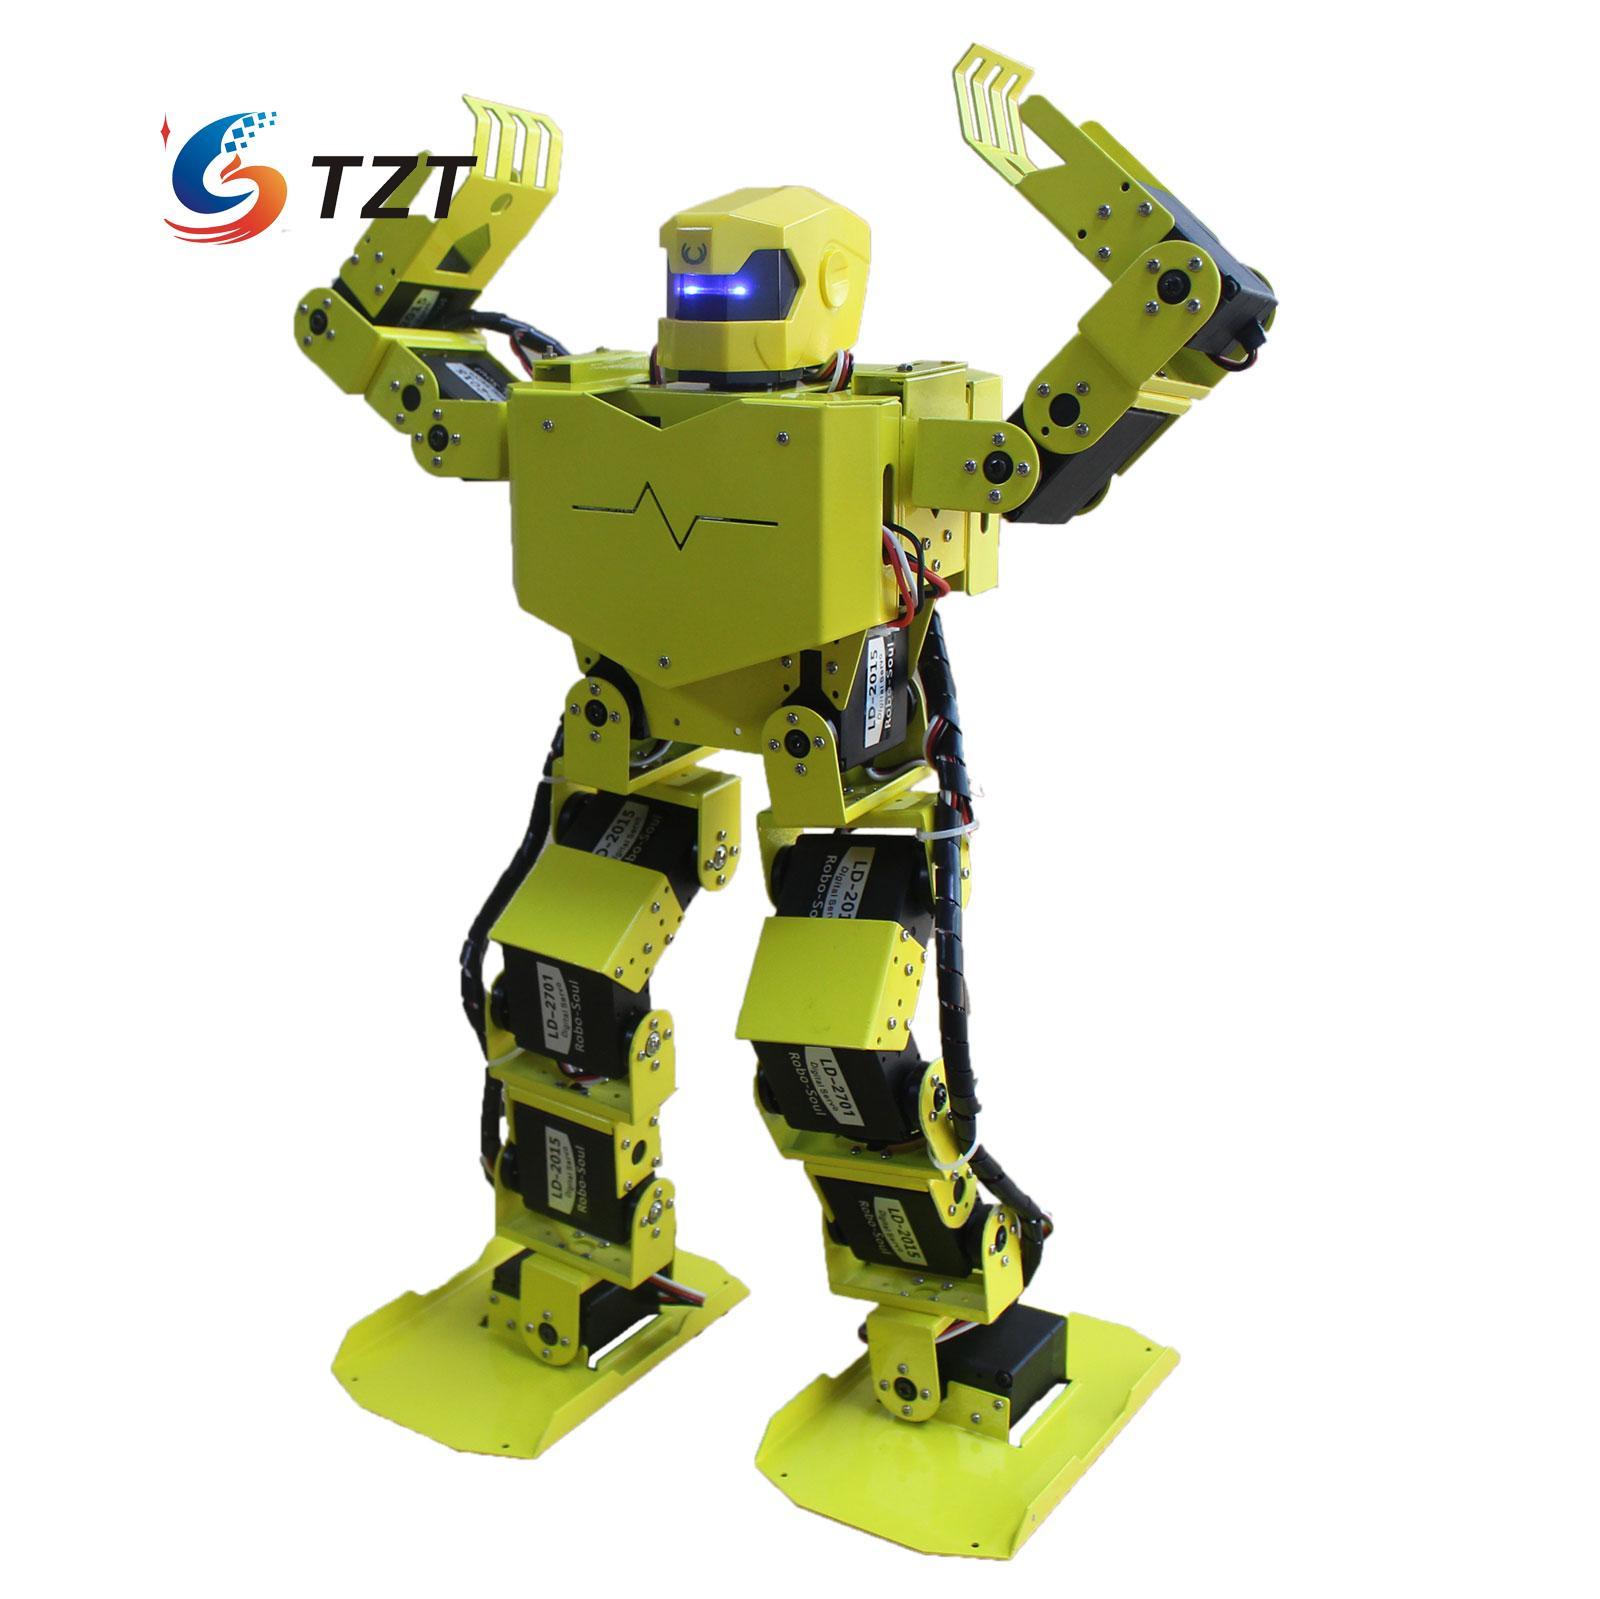 16DOF Robo-Soul H3.0 Biped Robotics Two Leg Human Robot Aluminum Frame Kit with Servos & Helmet Unassembled soldier king 16dof smart humanoid robot frame kits contest dance biped robotics with servos for diy unassembled